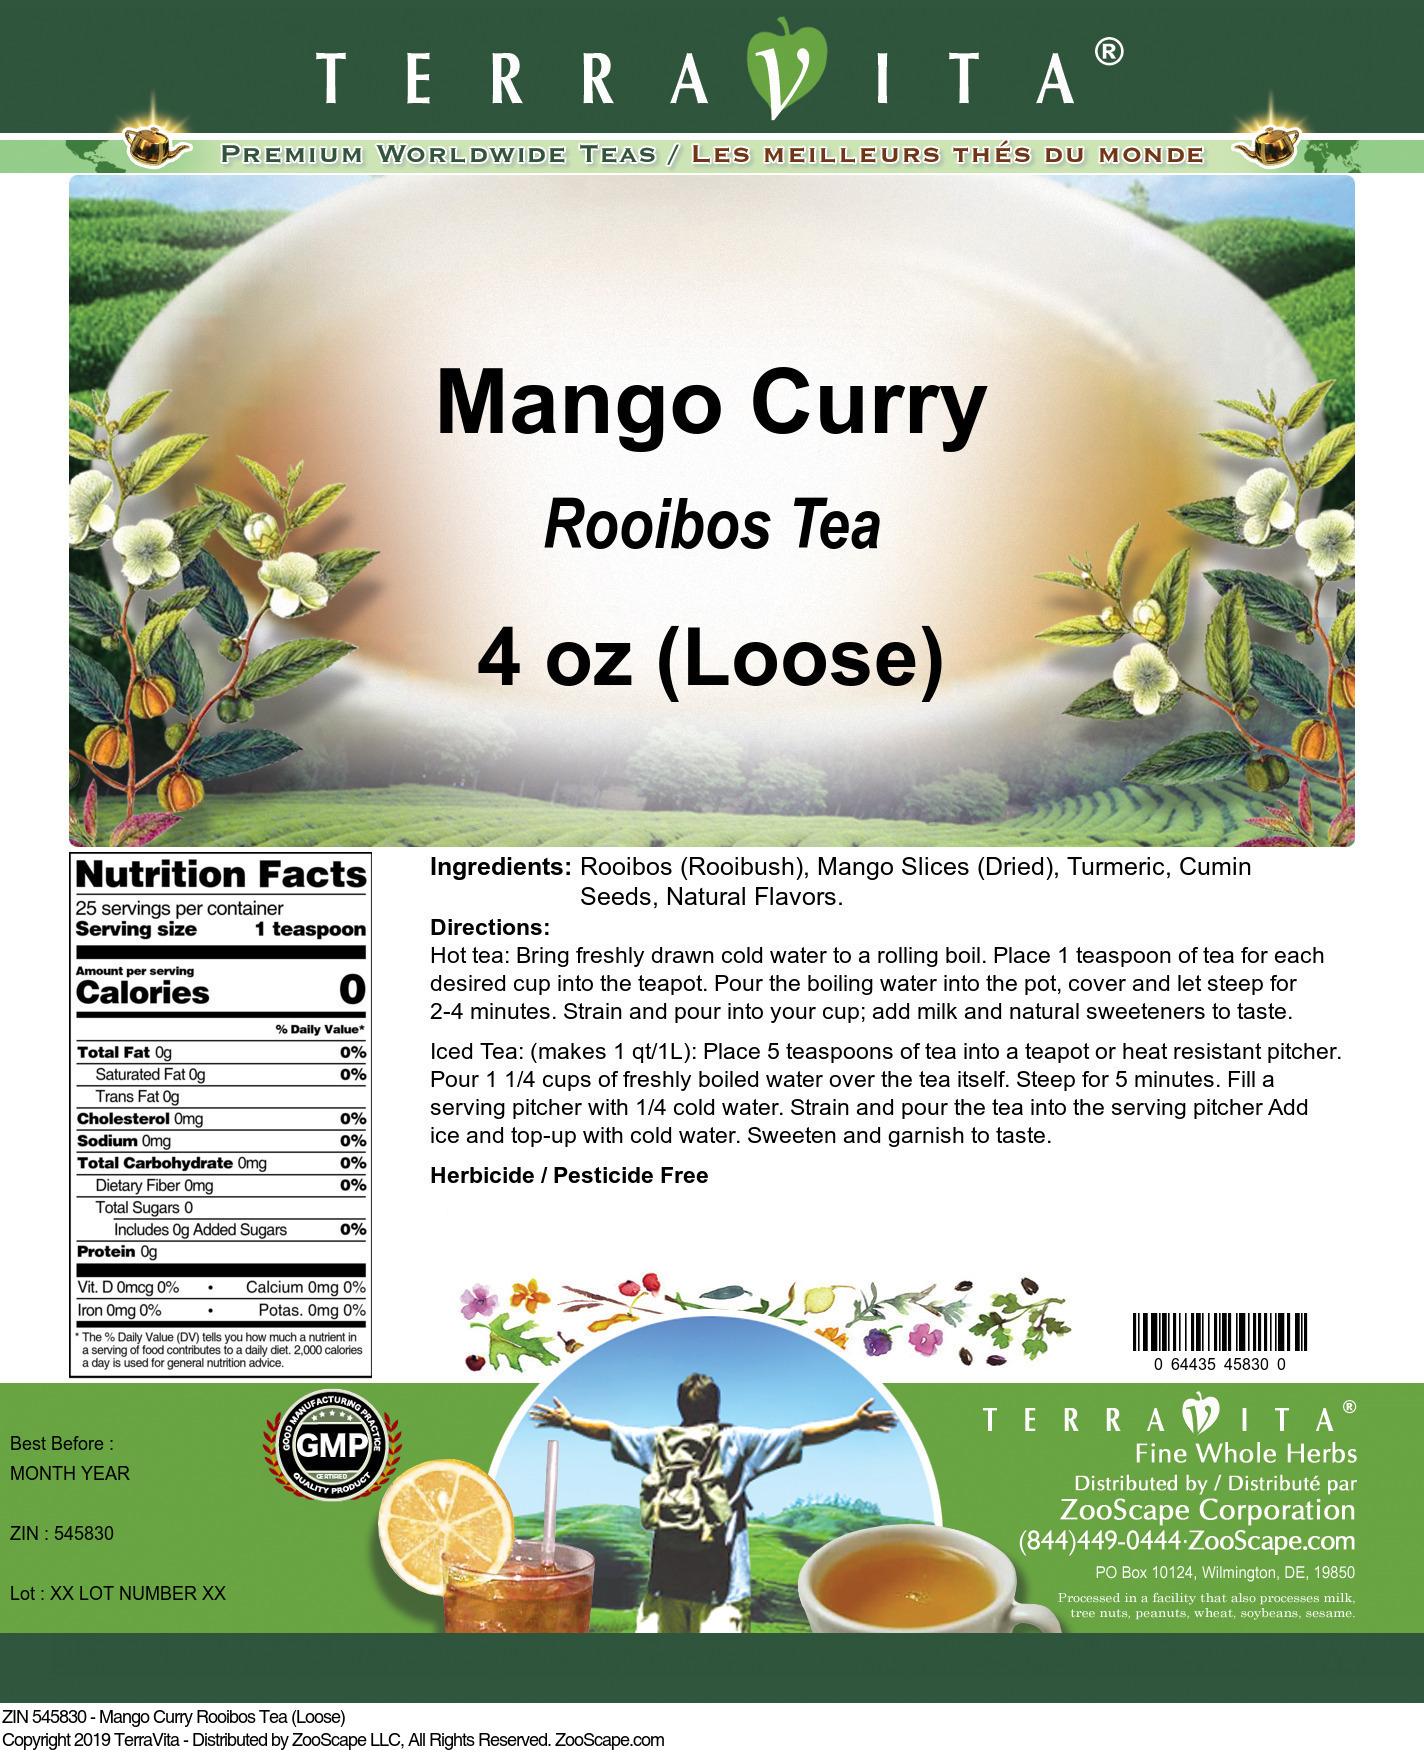 Mango Curry Rooibos Tea (Loose)